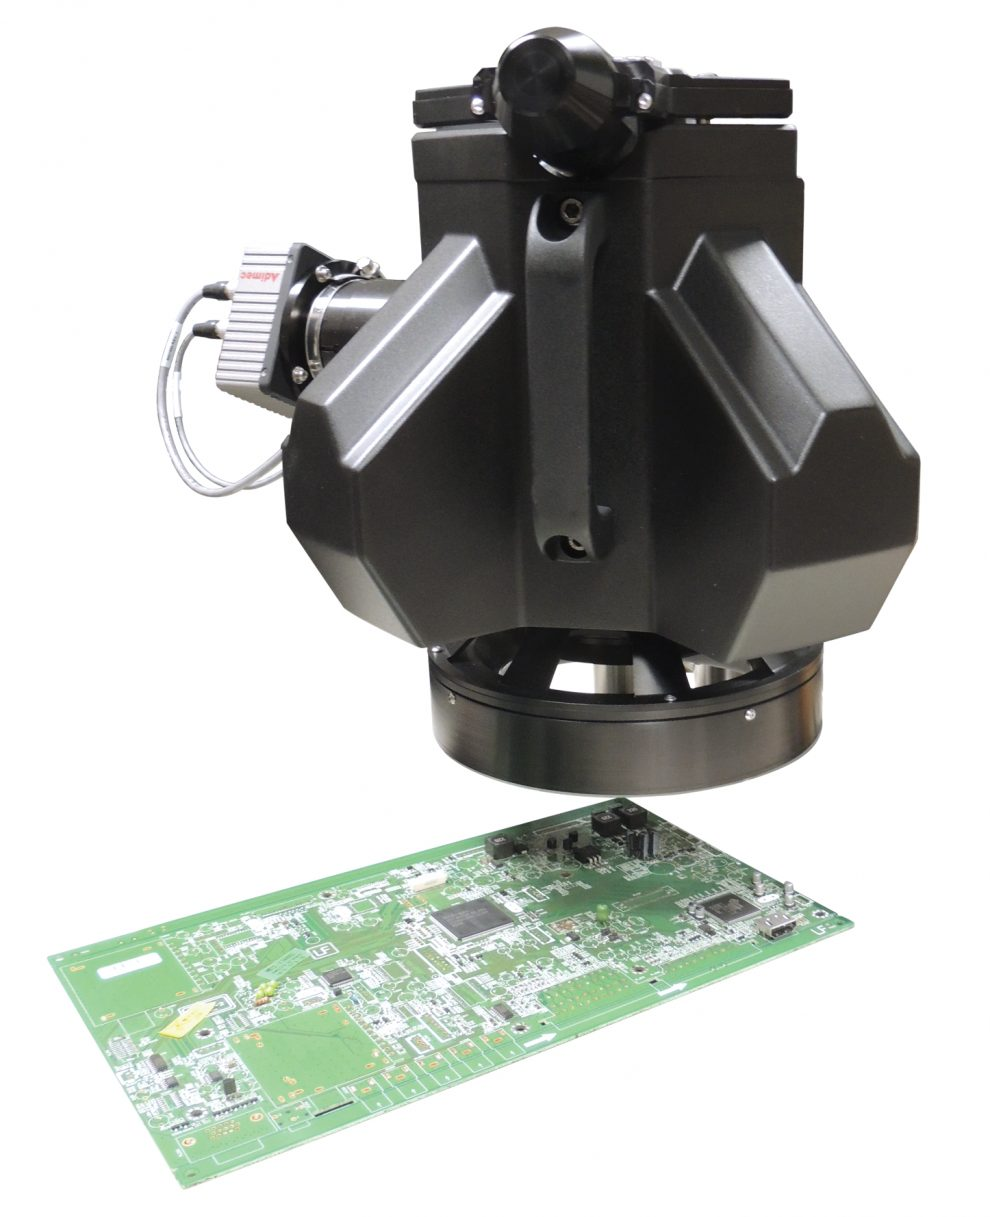 MRS sensor